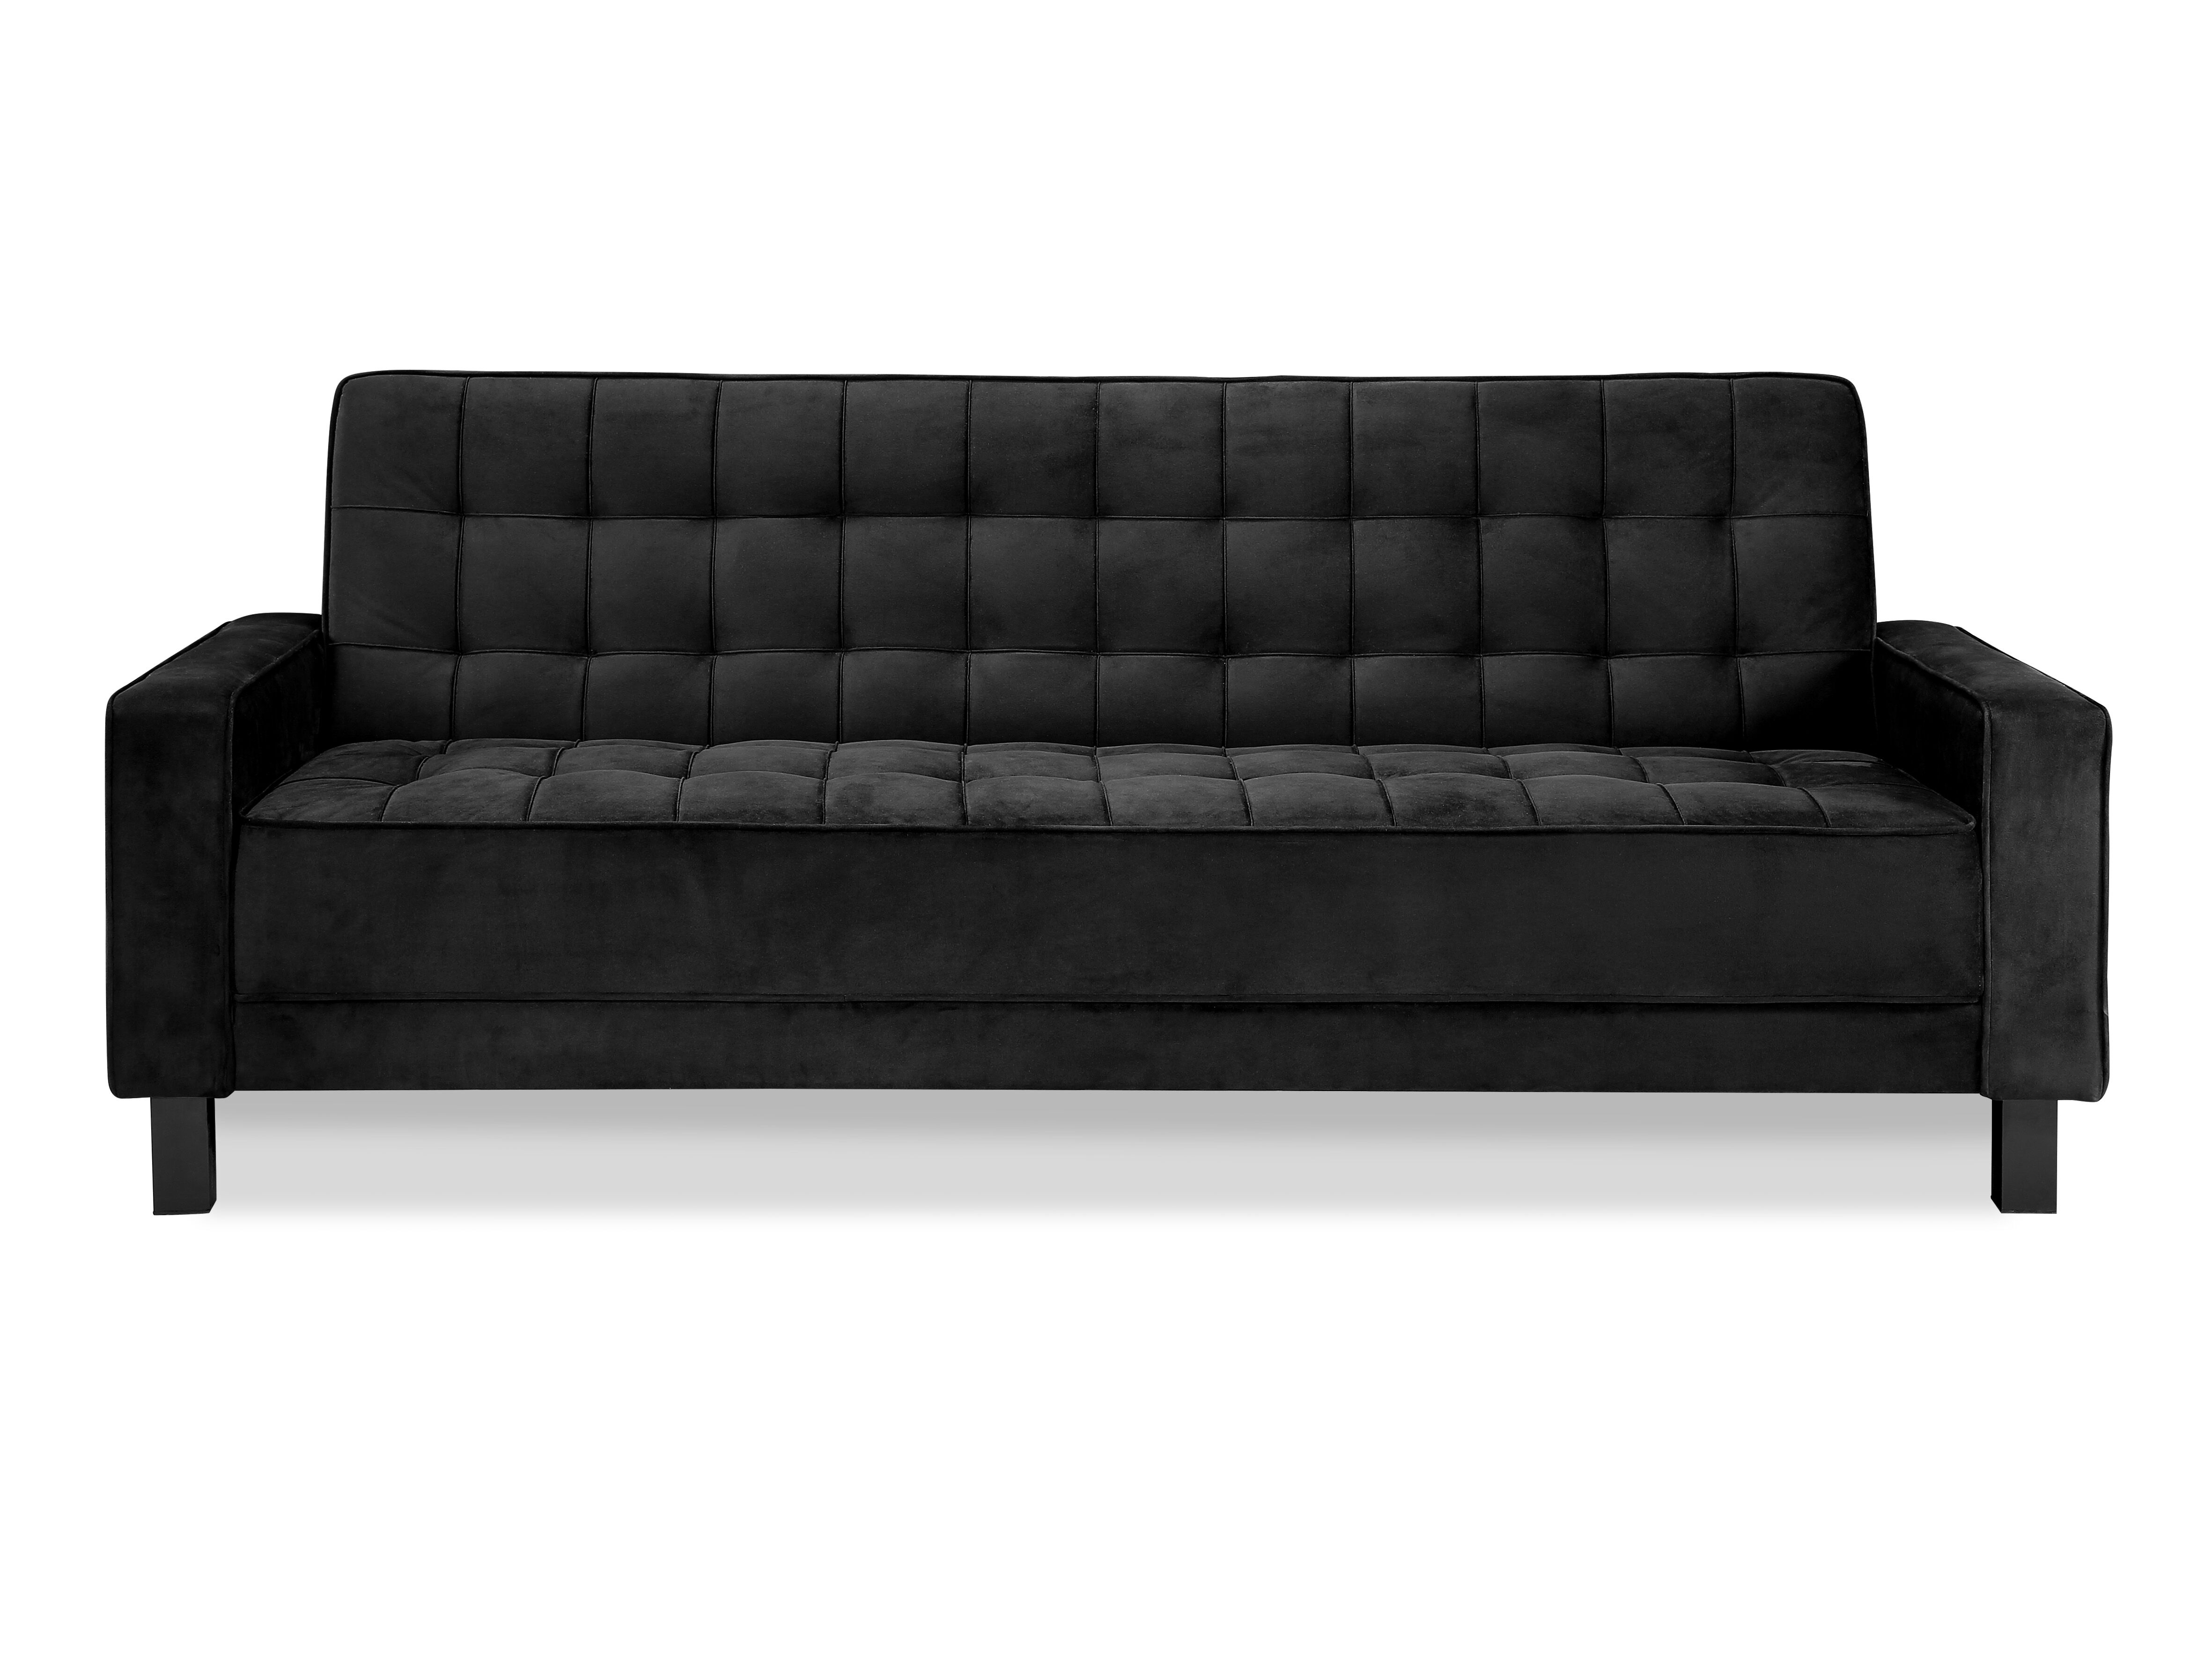 McKinley Convertible Sofa Black by Serta Lifestyle